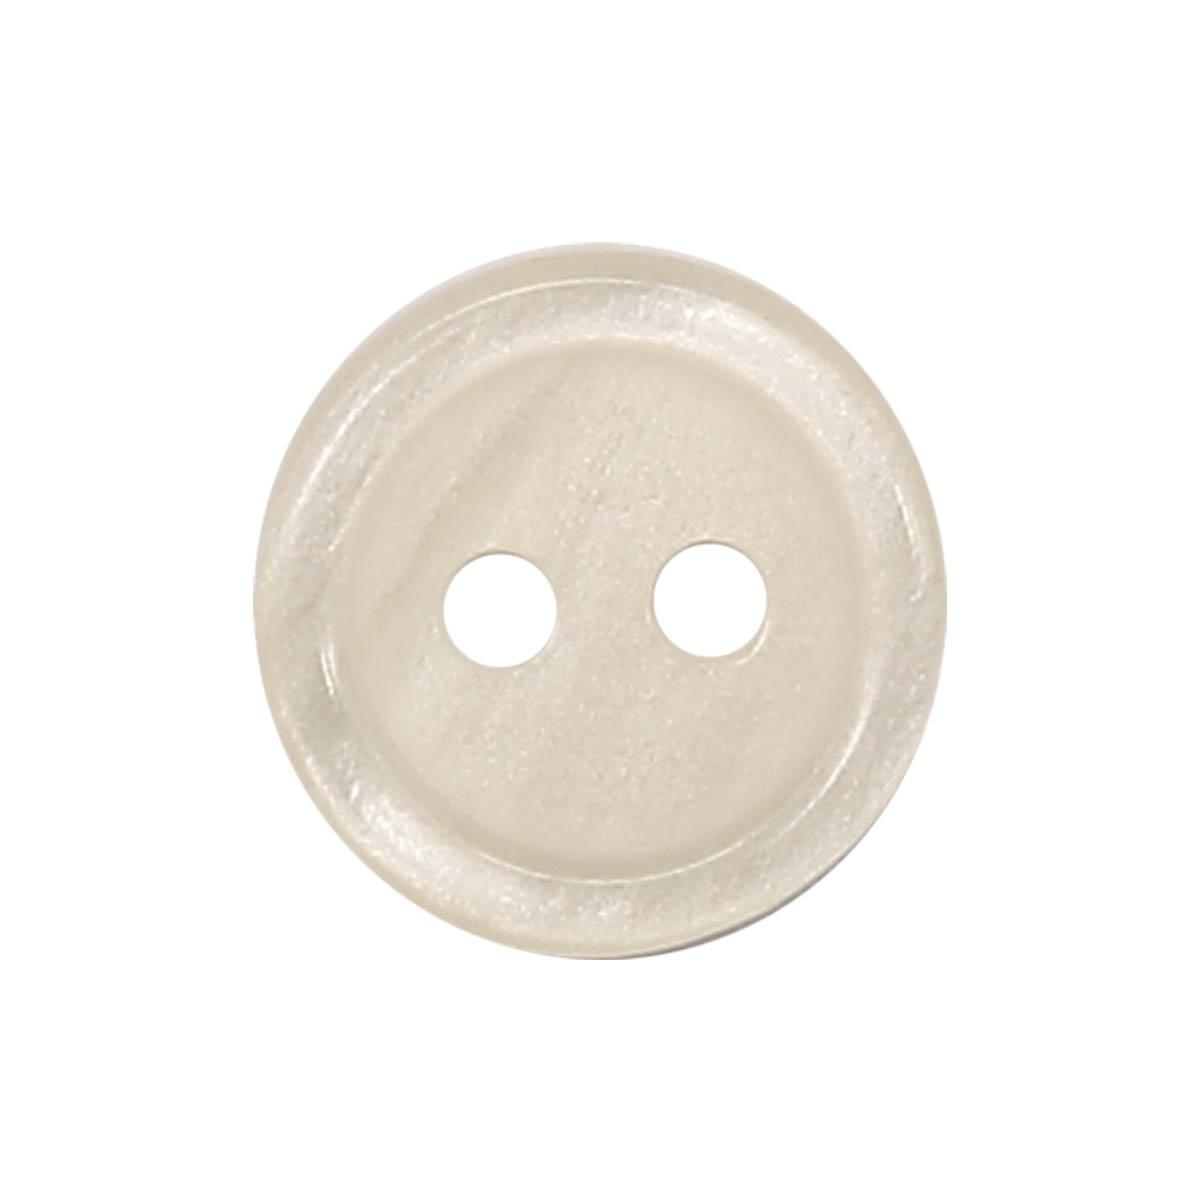 35483/2 18 (3561) Пуговица 2прокола крем.глянц.полиэстер ГР